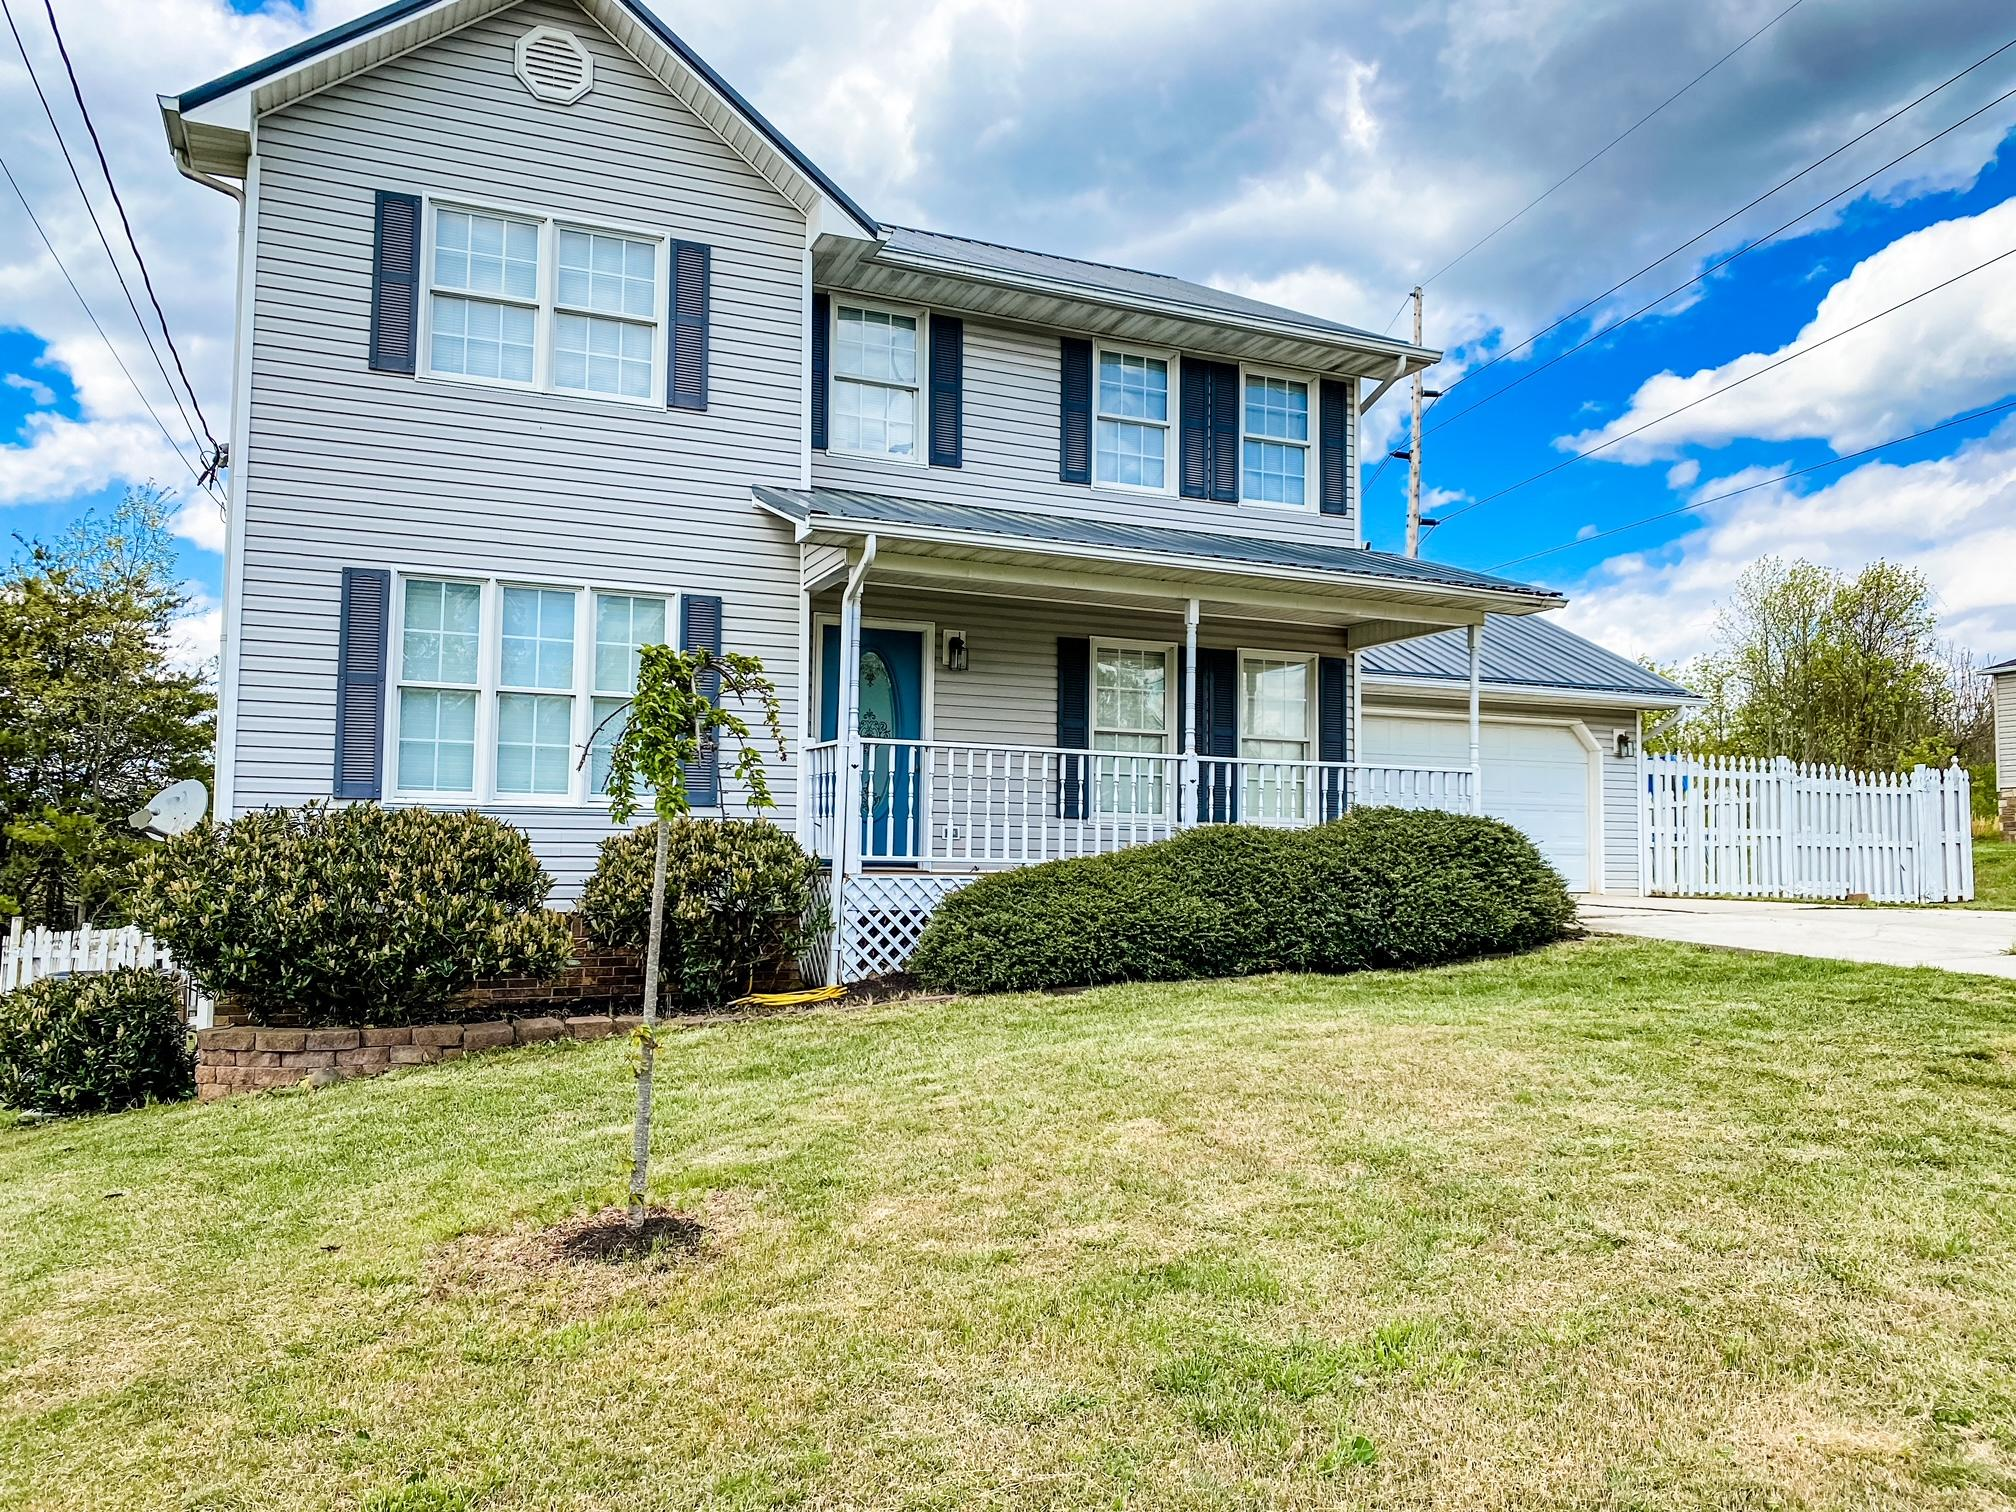 1136 Faye Street, Kingsport, Tennessee 37660, 3 Bedrooms Bedrooms, ,3 BathroomsBathrooms,Single Family,For Sale,1136 Faye Street,2,9921365